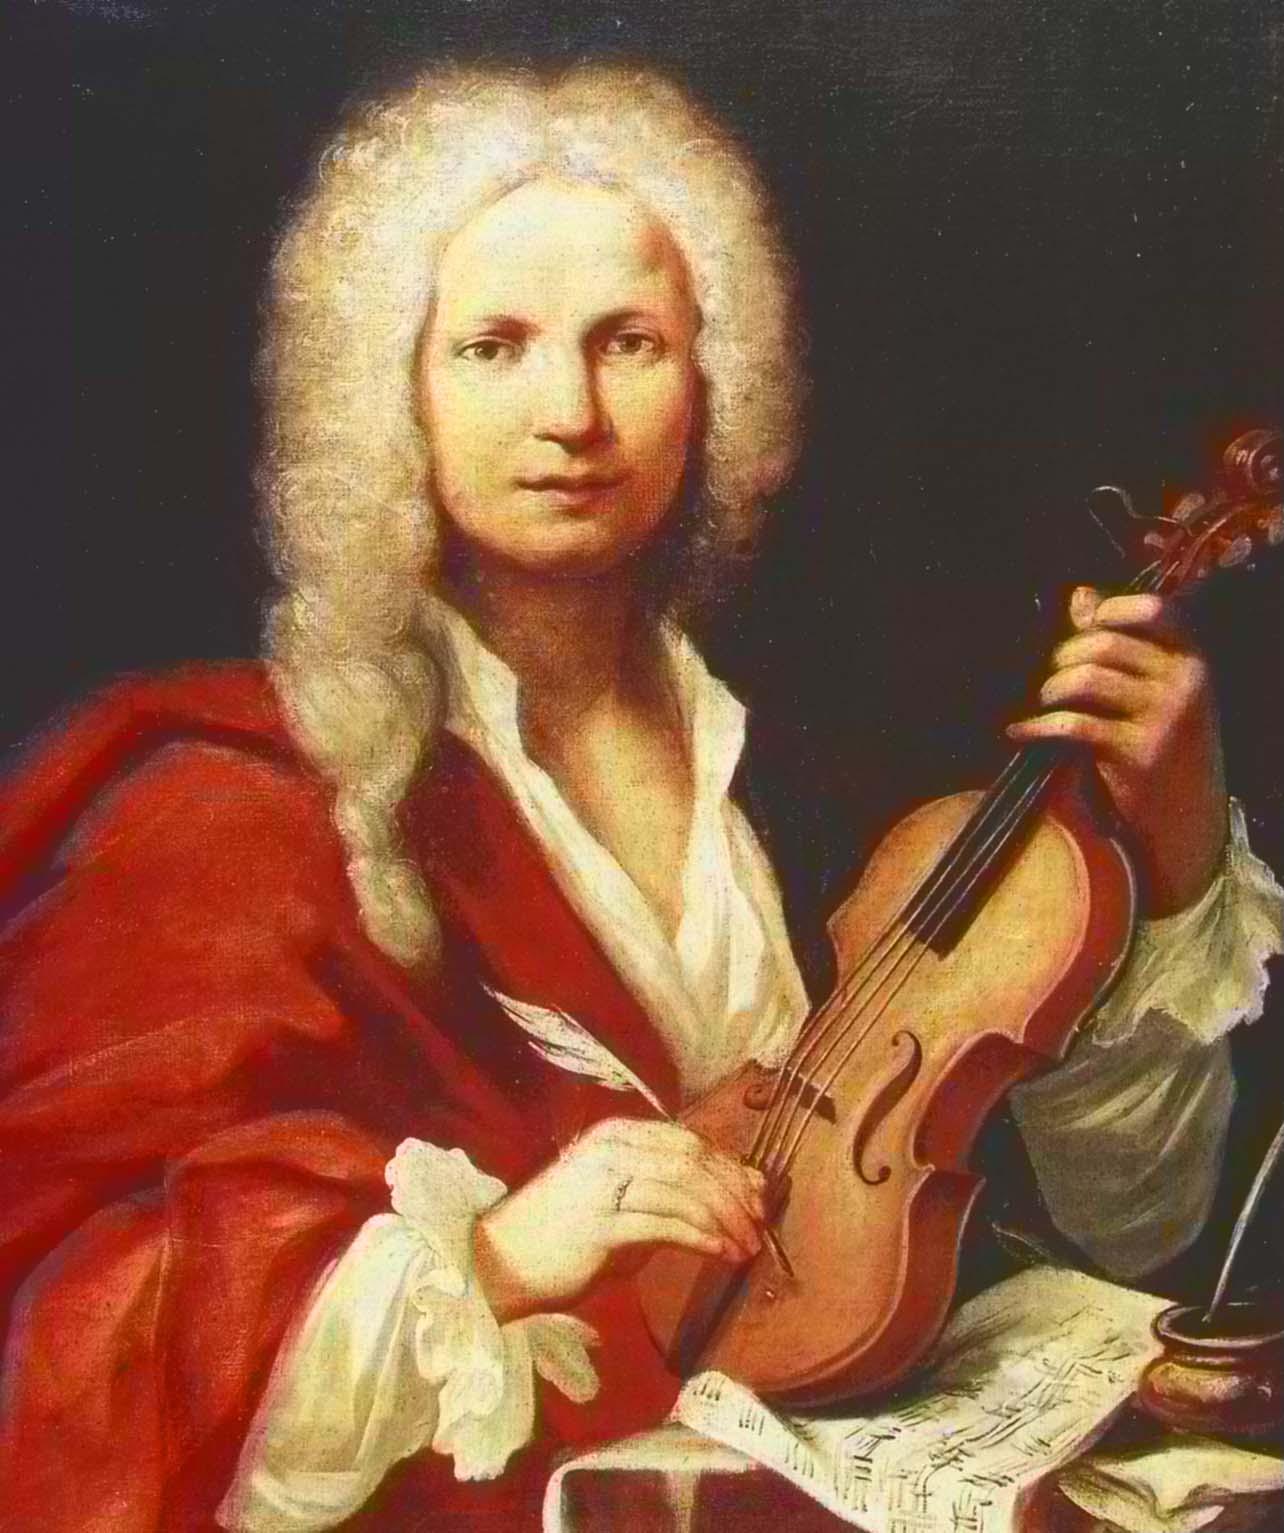 Antonio Vivaldi | Classical Music Wiki | FANDOM powered by Wikia